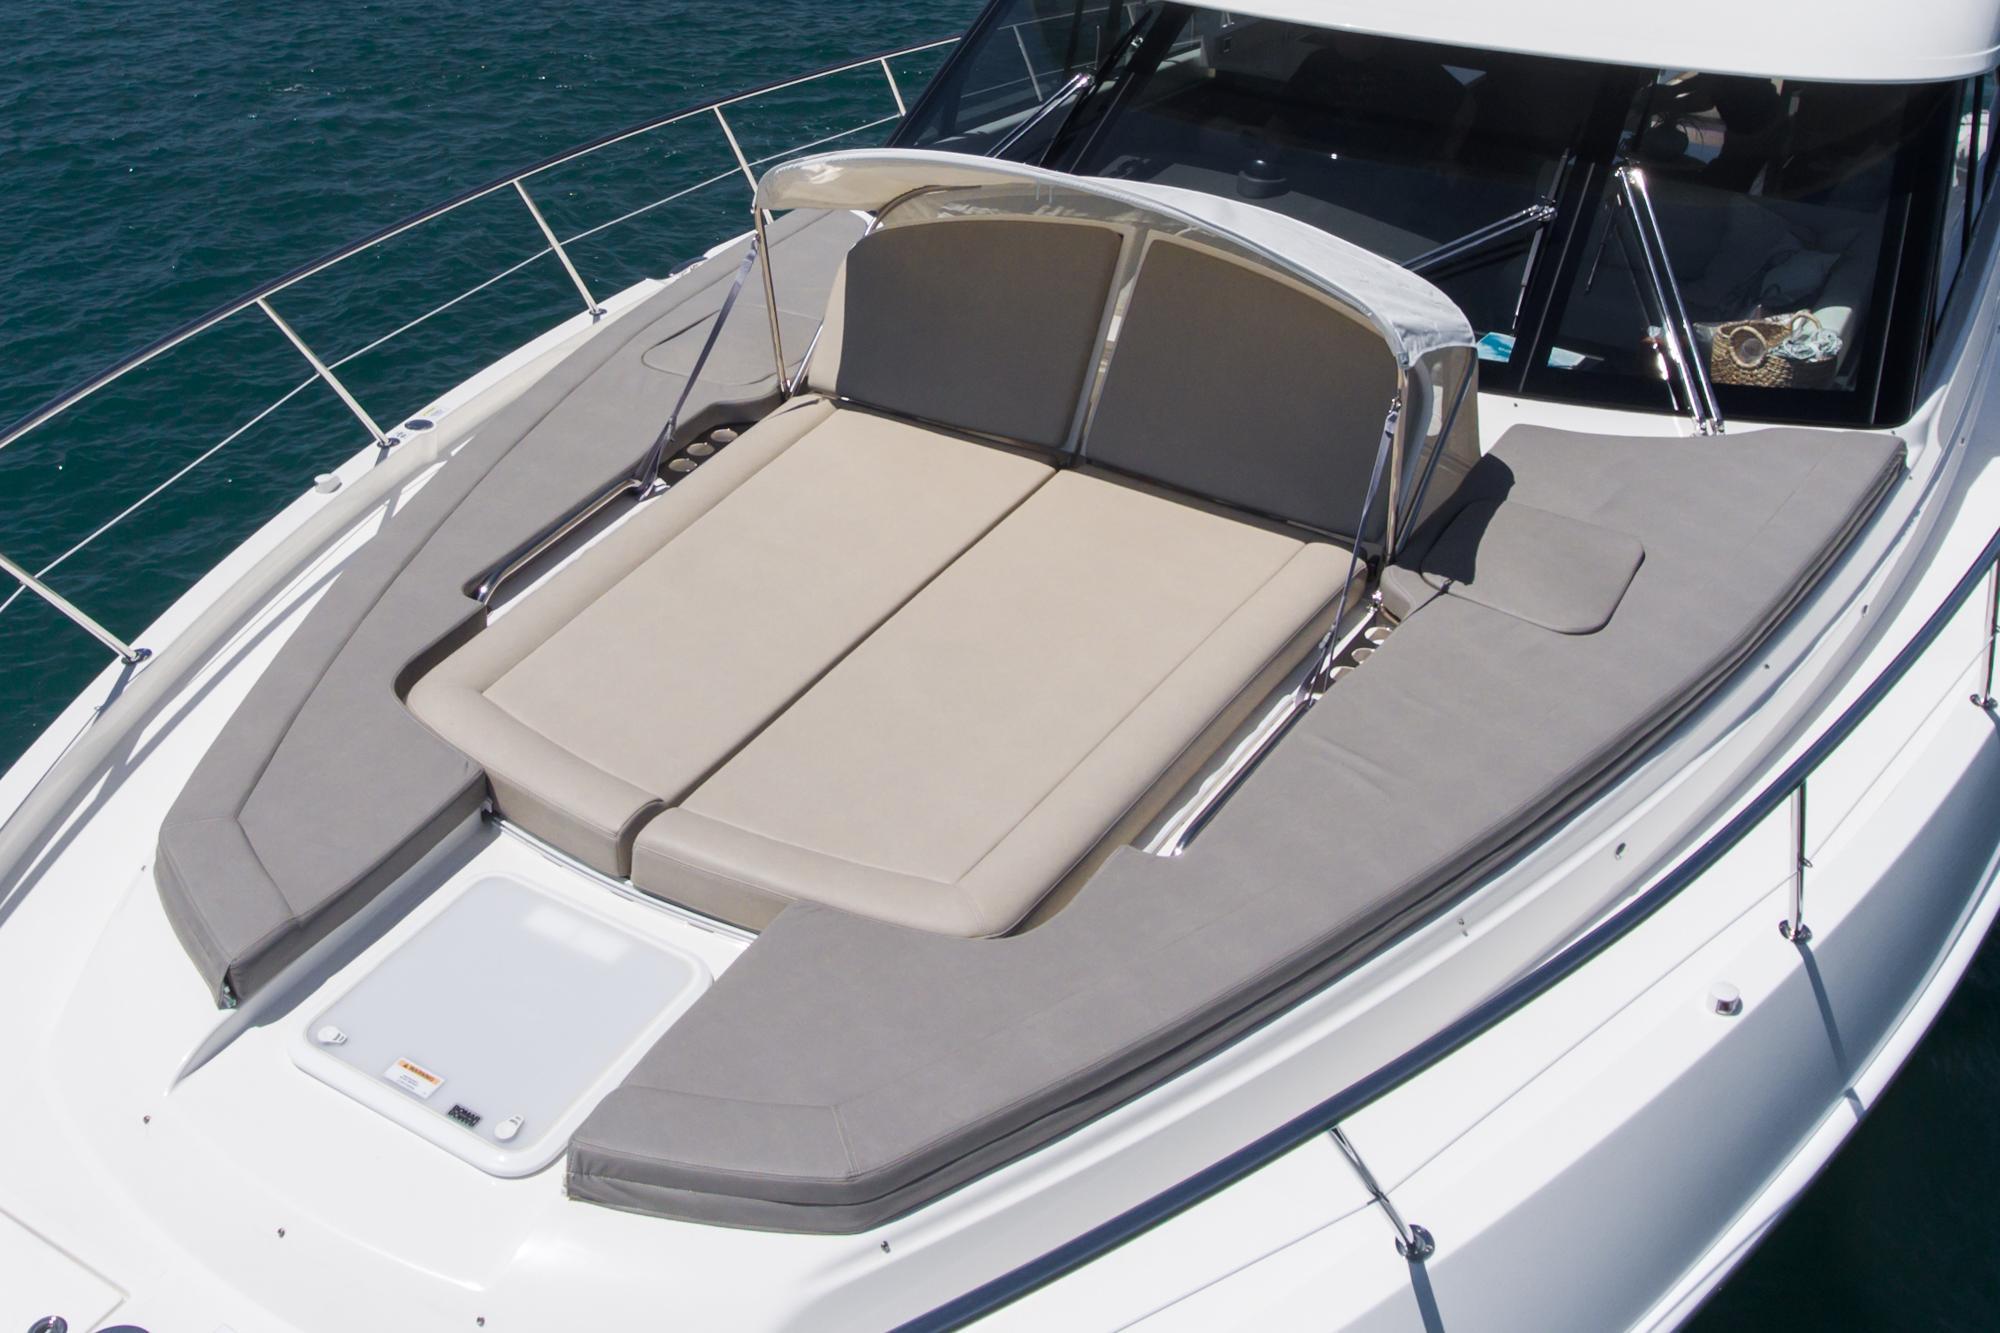 2019 Riviera 5400 Sport Yacht #TB5405MC-LLC inventory image at Sun Country Coastal in Dana Point